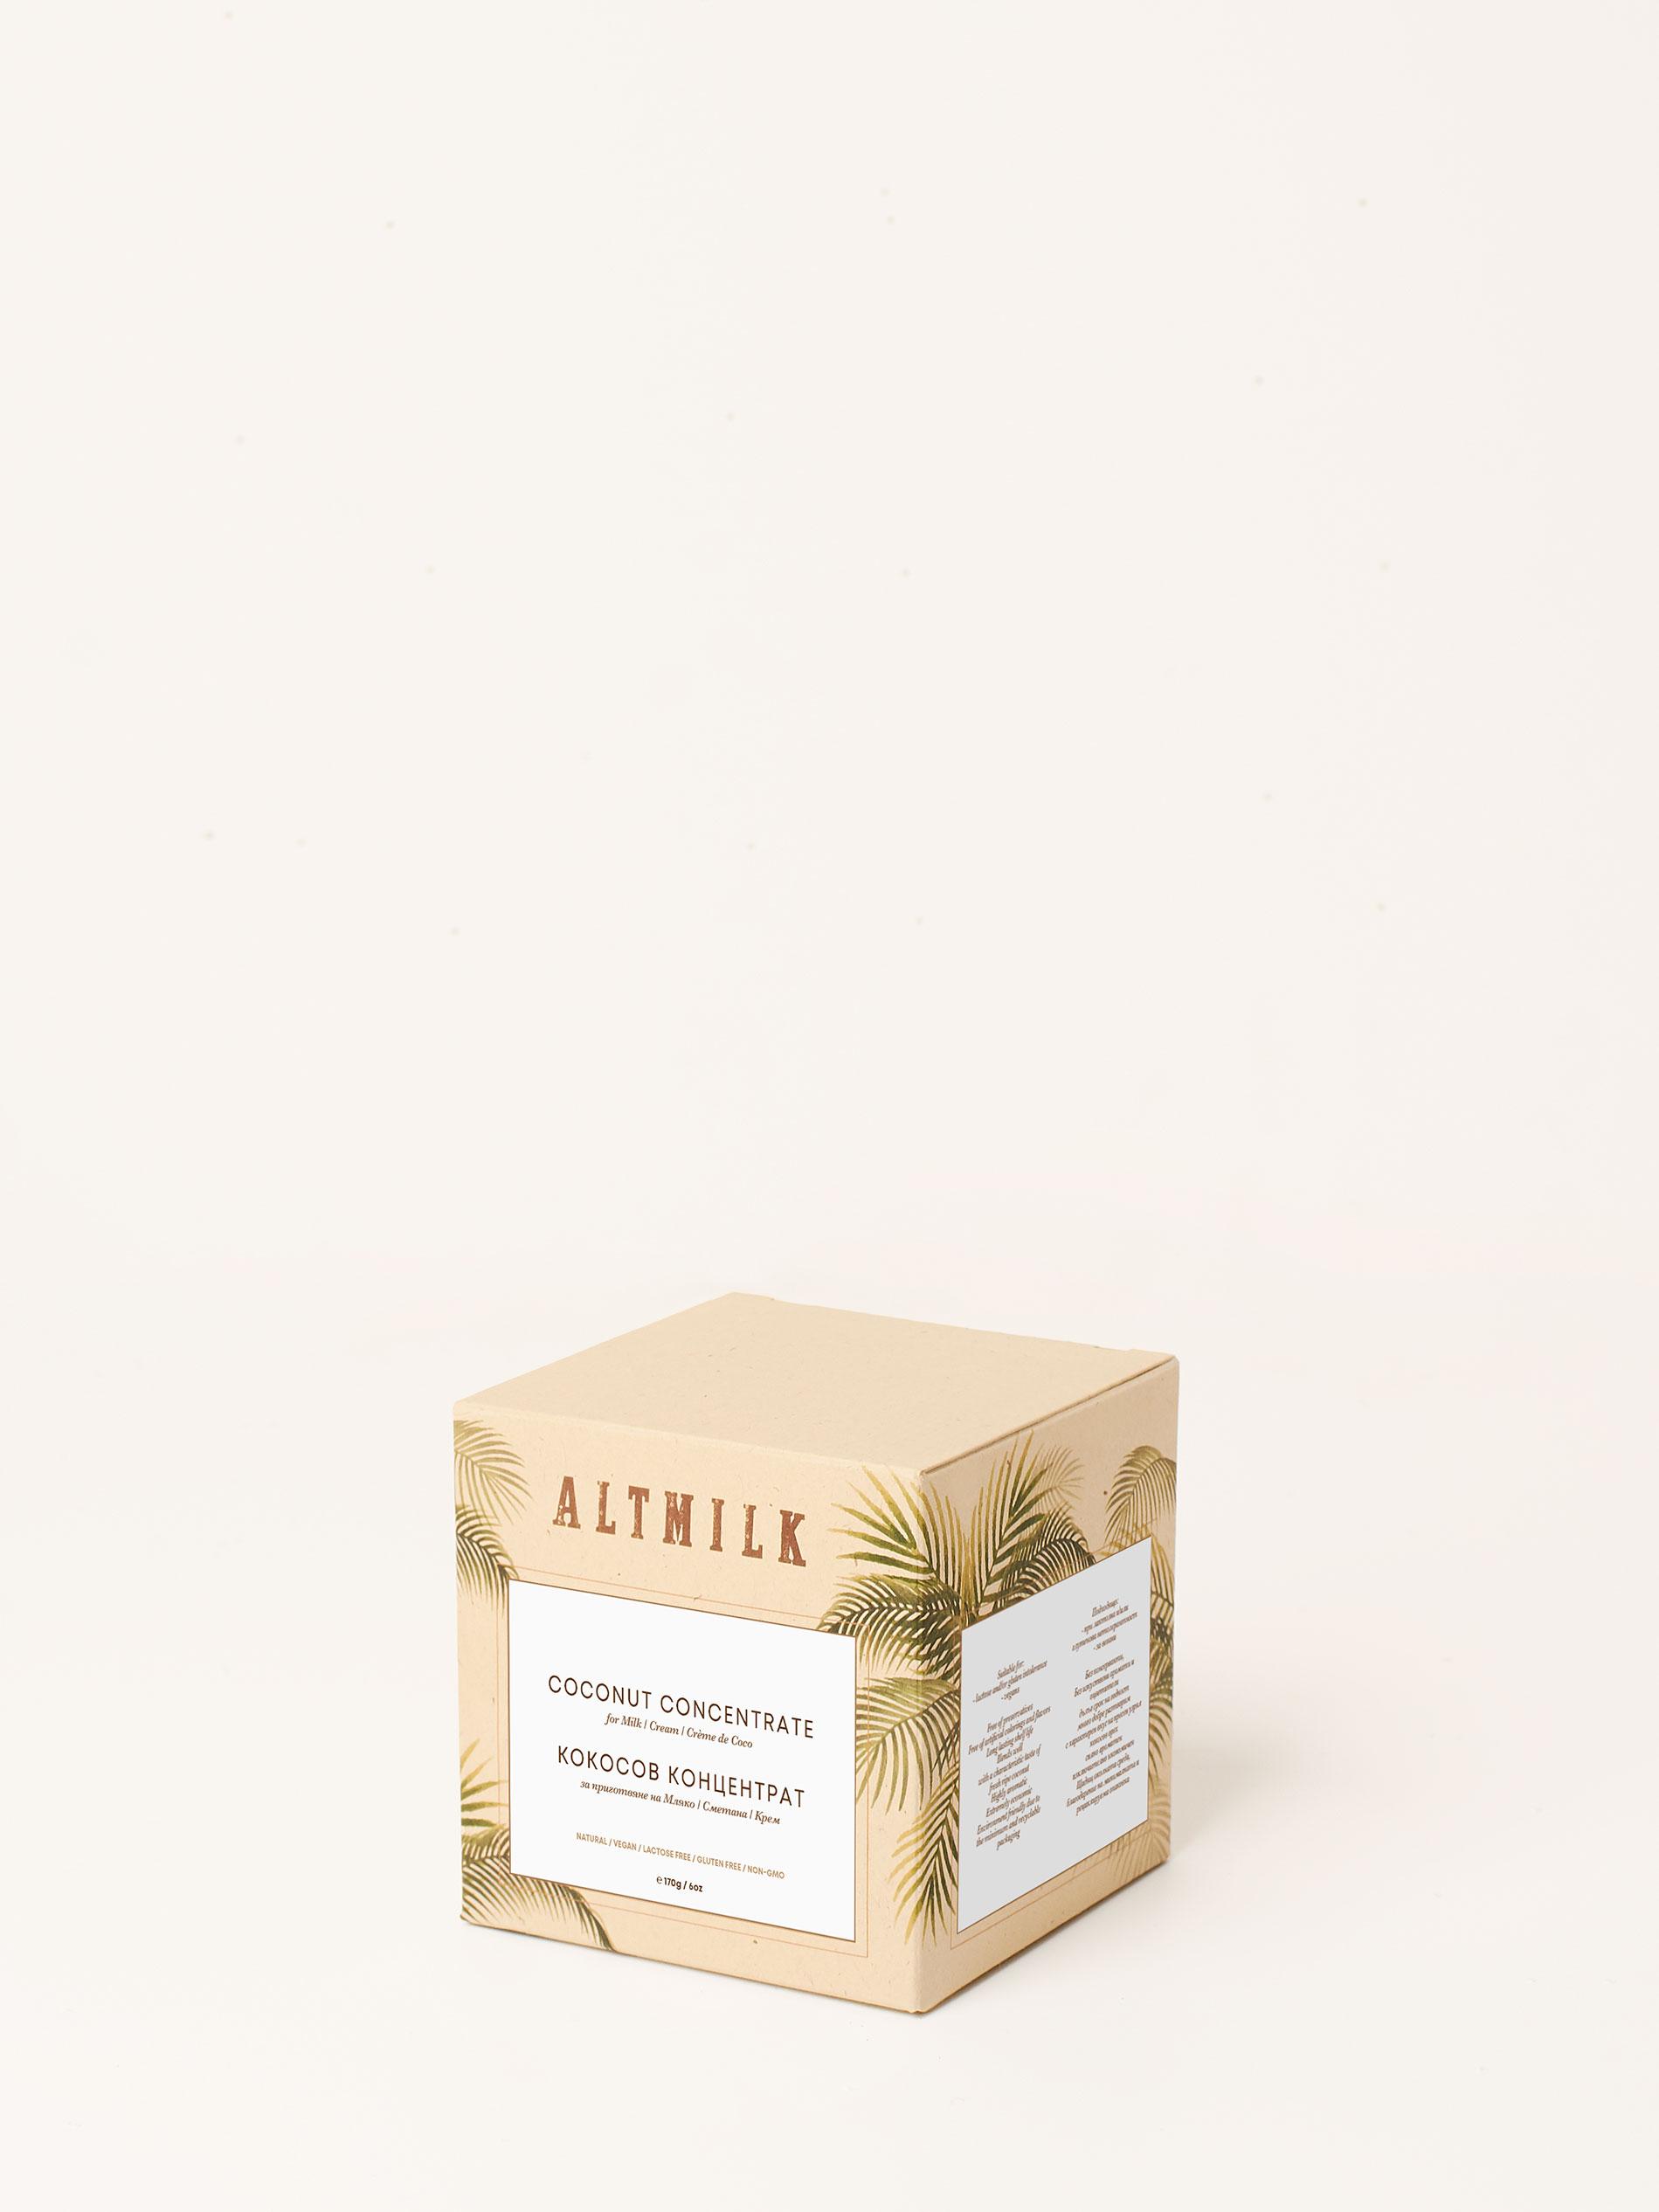 altmilk-boxes-02-flat